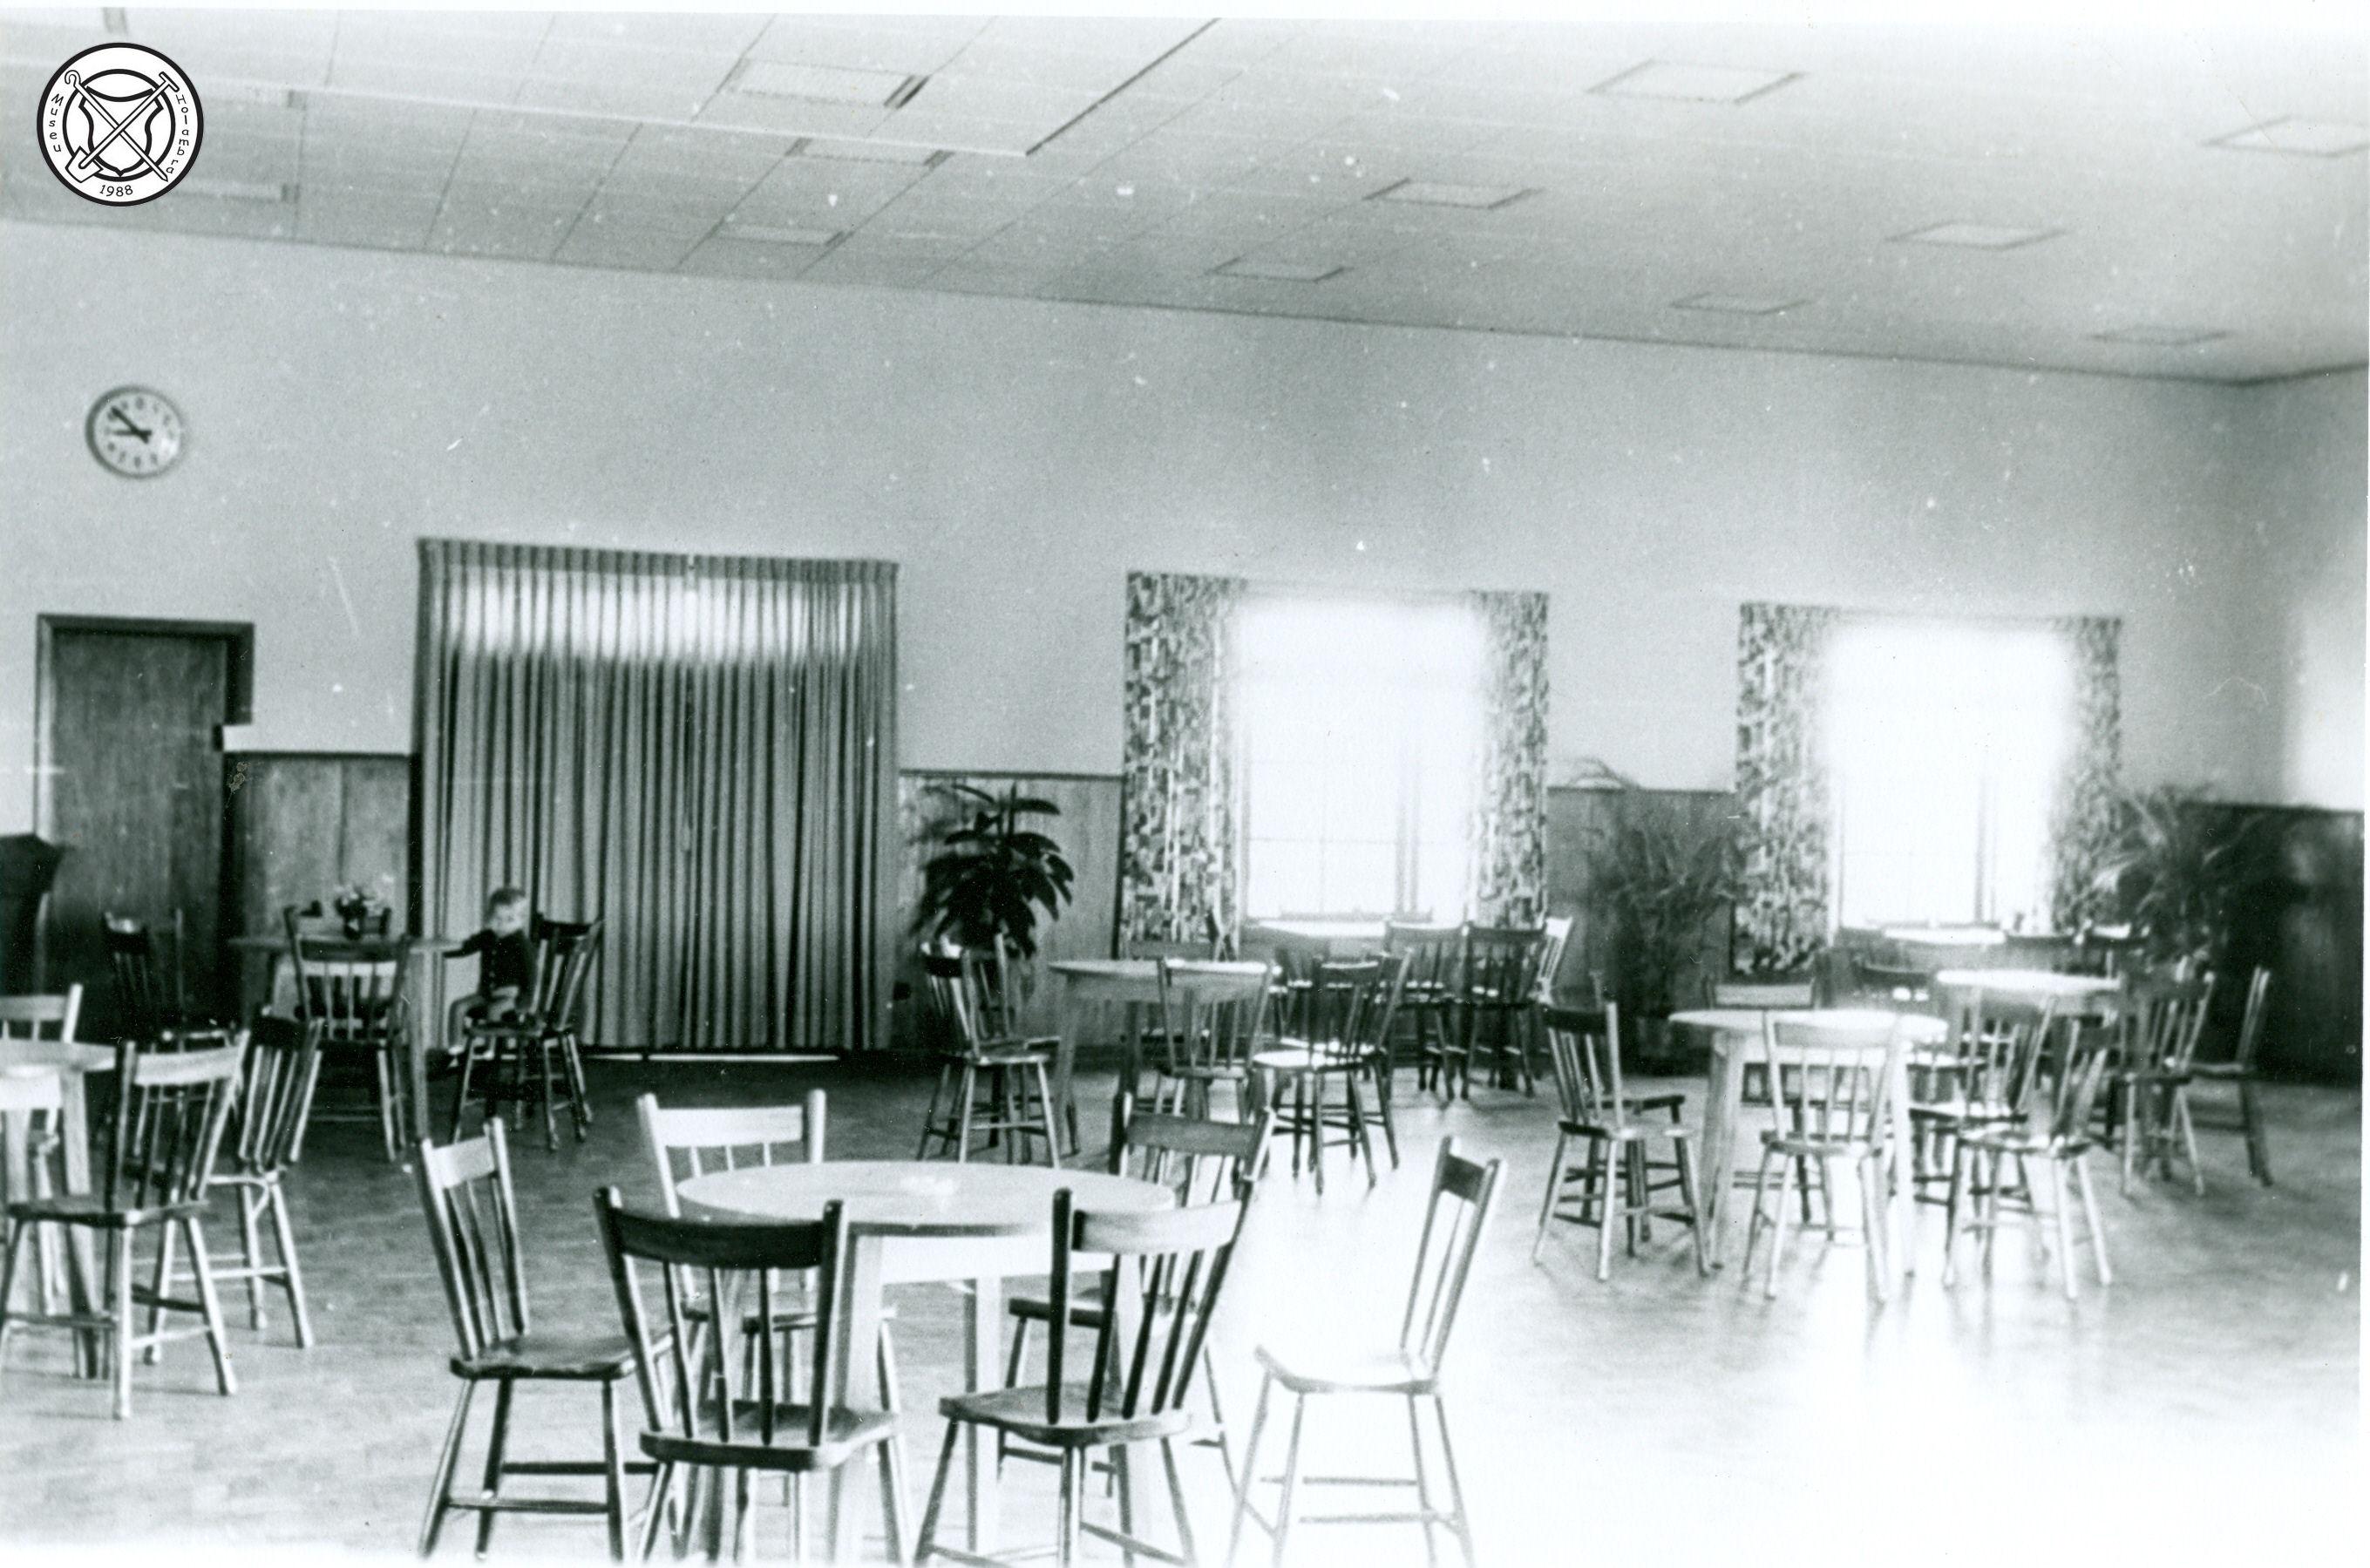 Interieur van de Club